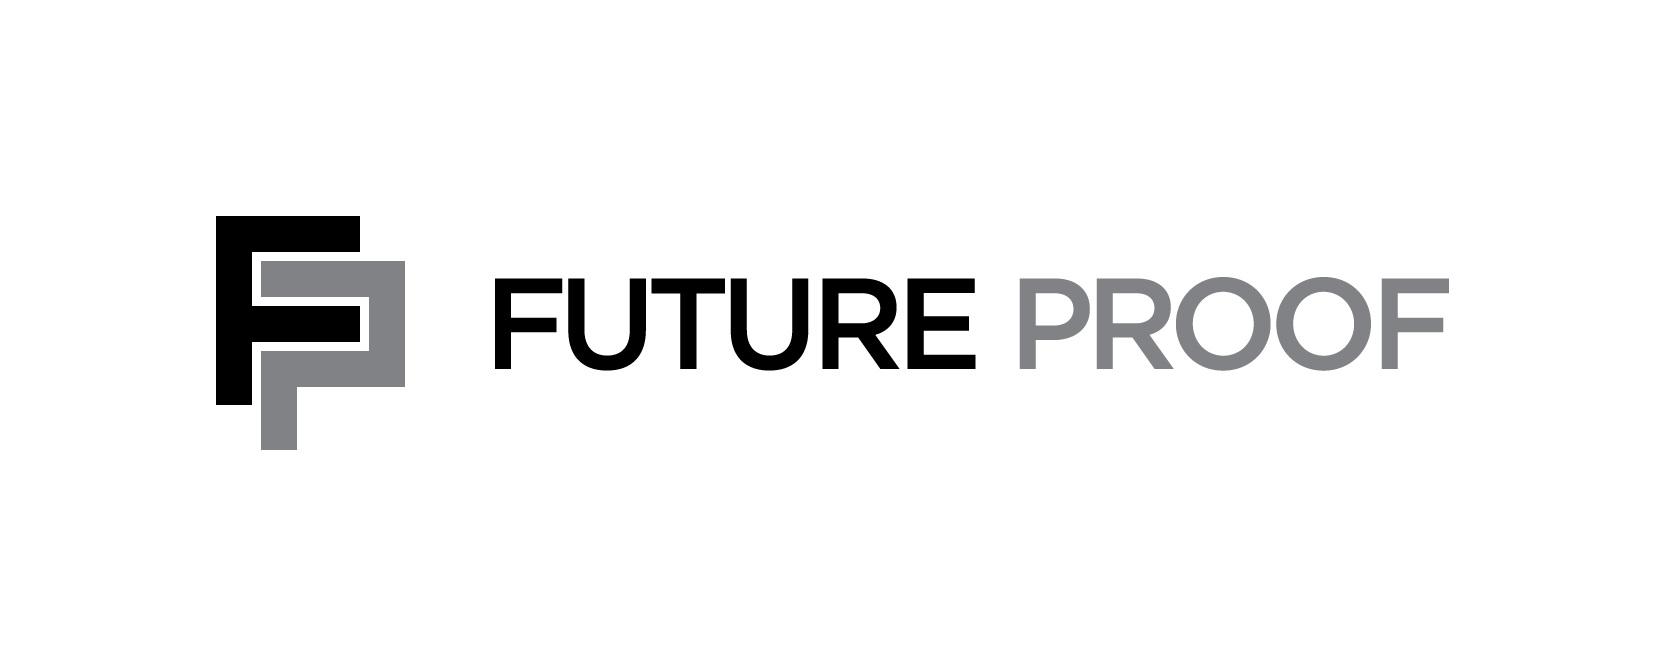 futureproof_logo_001_greyscale.jpg